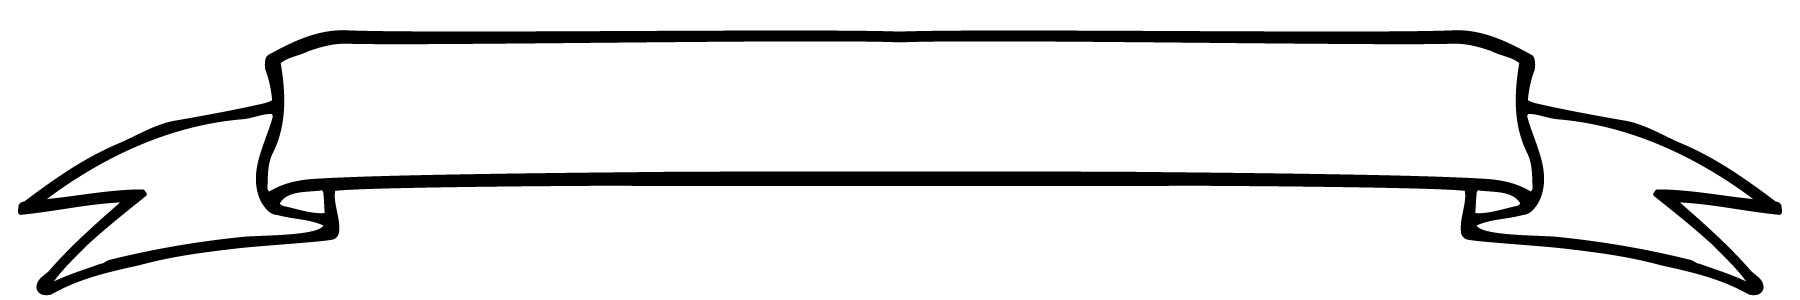 1800x300 Clip Art Banners Border Ribbon Scroll 101 Clip Art On White